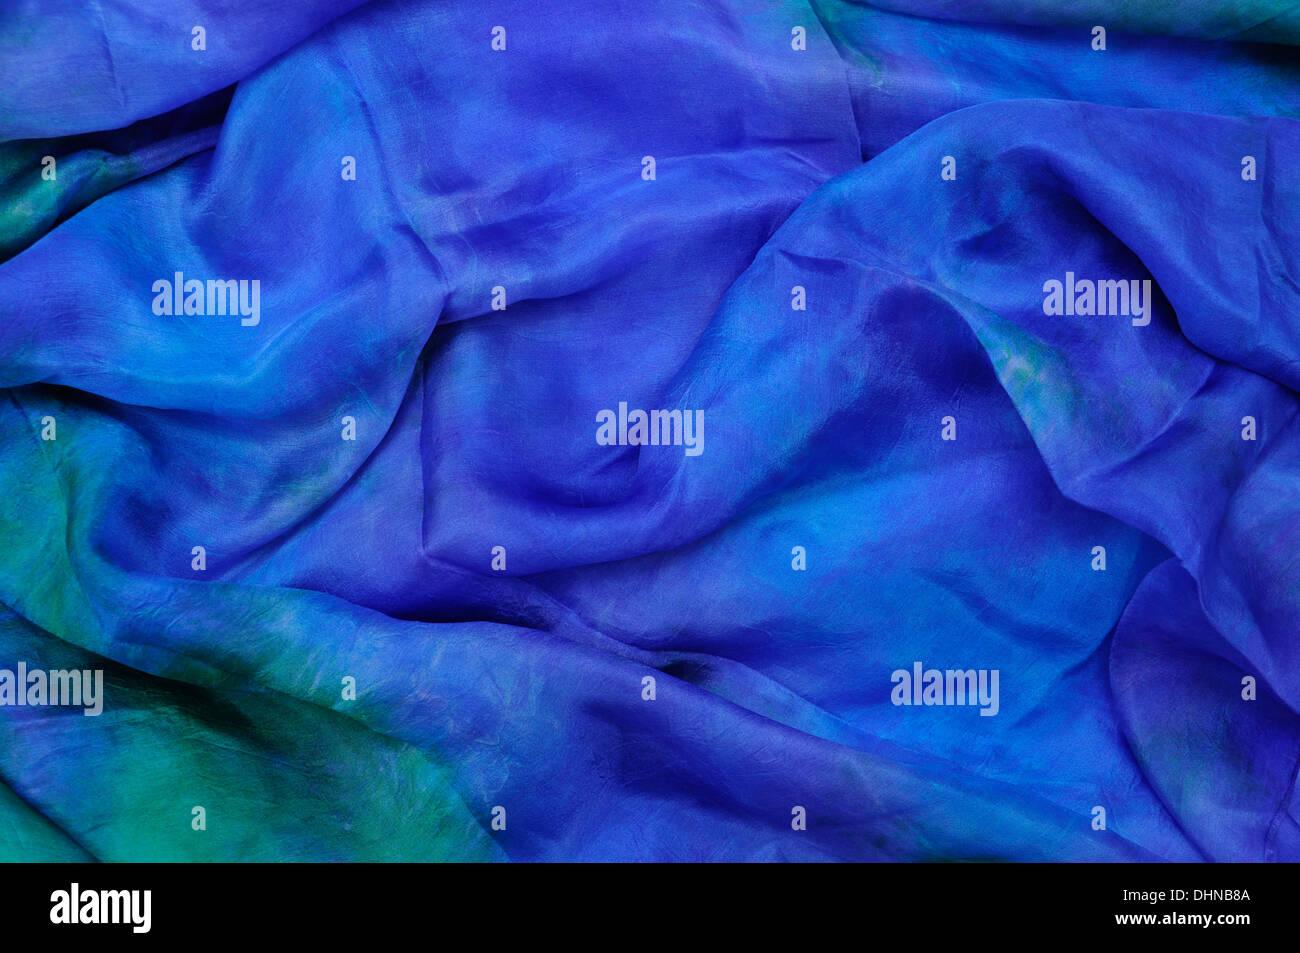 Blue silk chiffon drape background with emerald tints - Stock Image